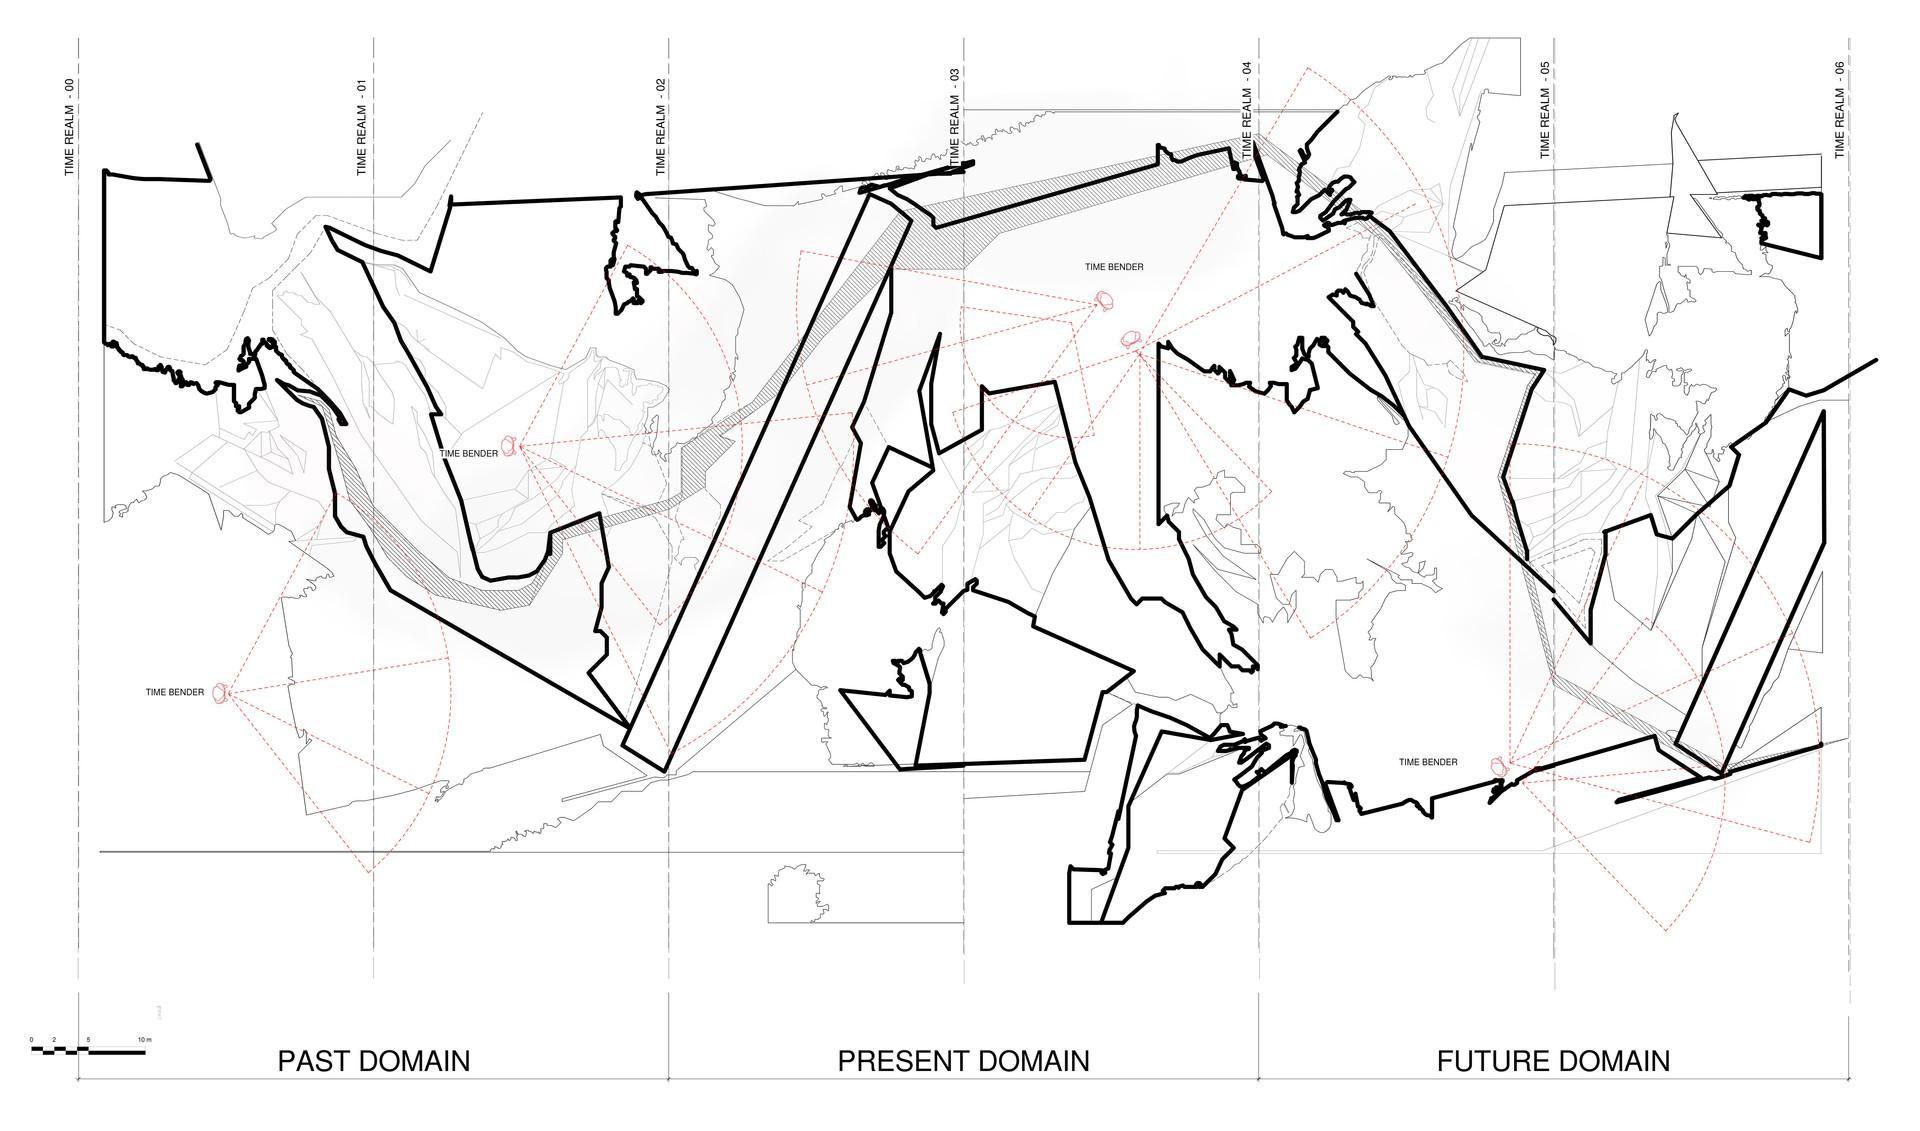 The Locator Map. Bhungeni, D. Unit 19. 2020.